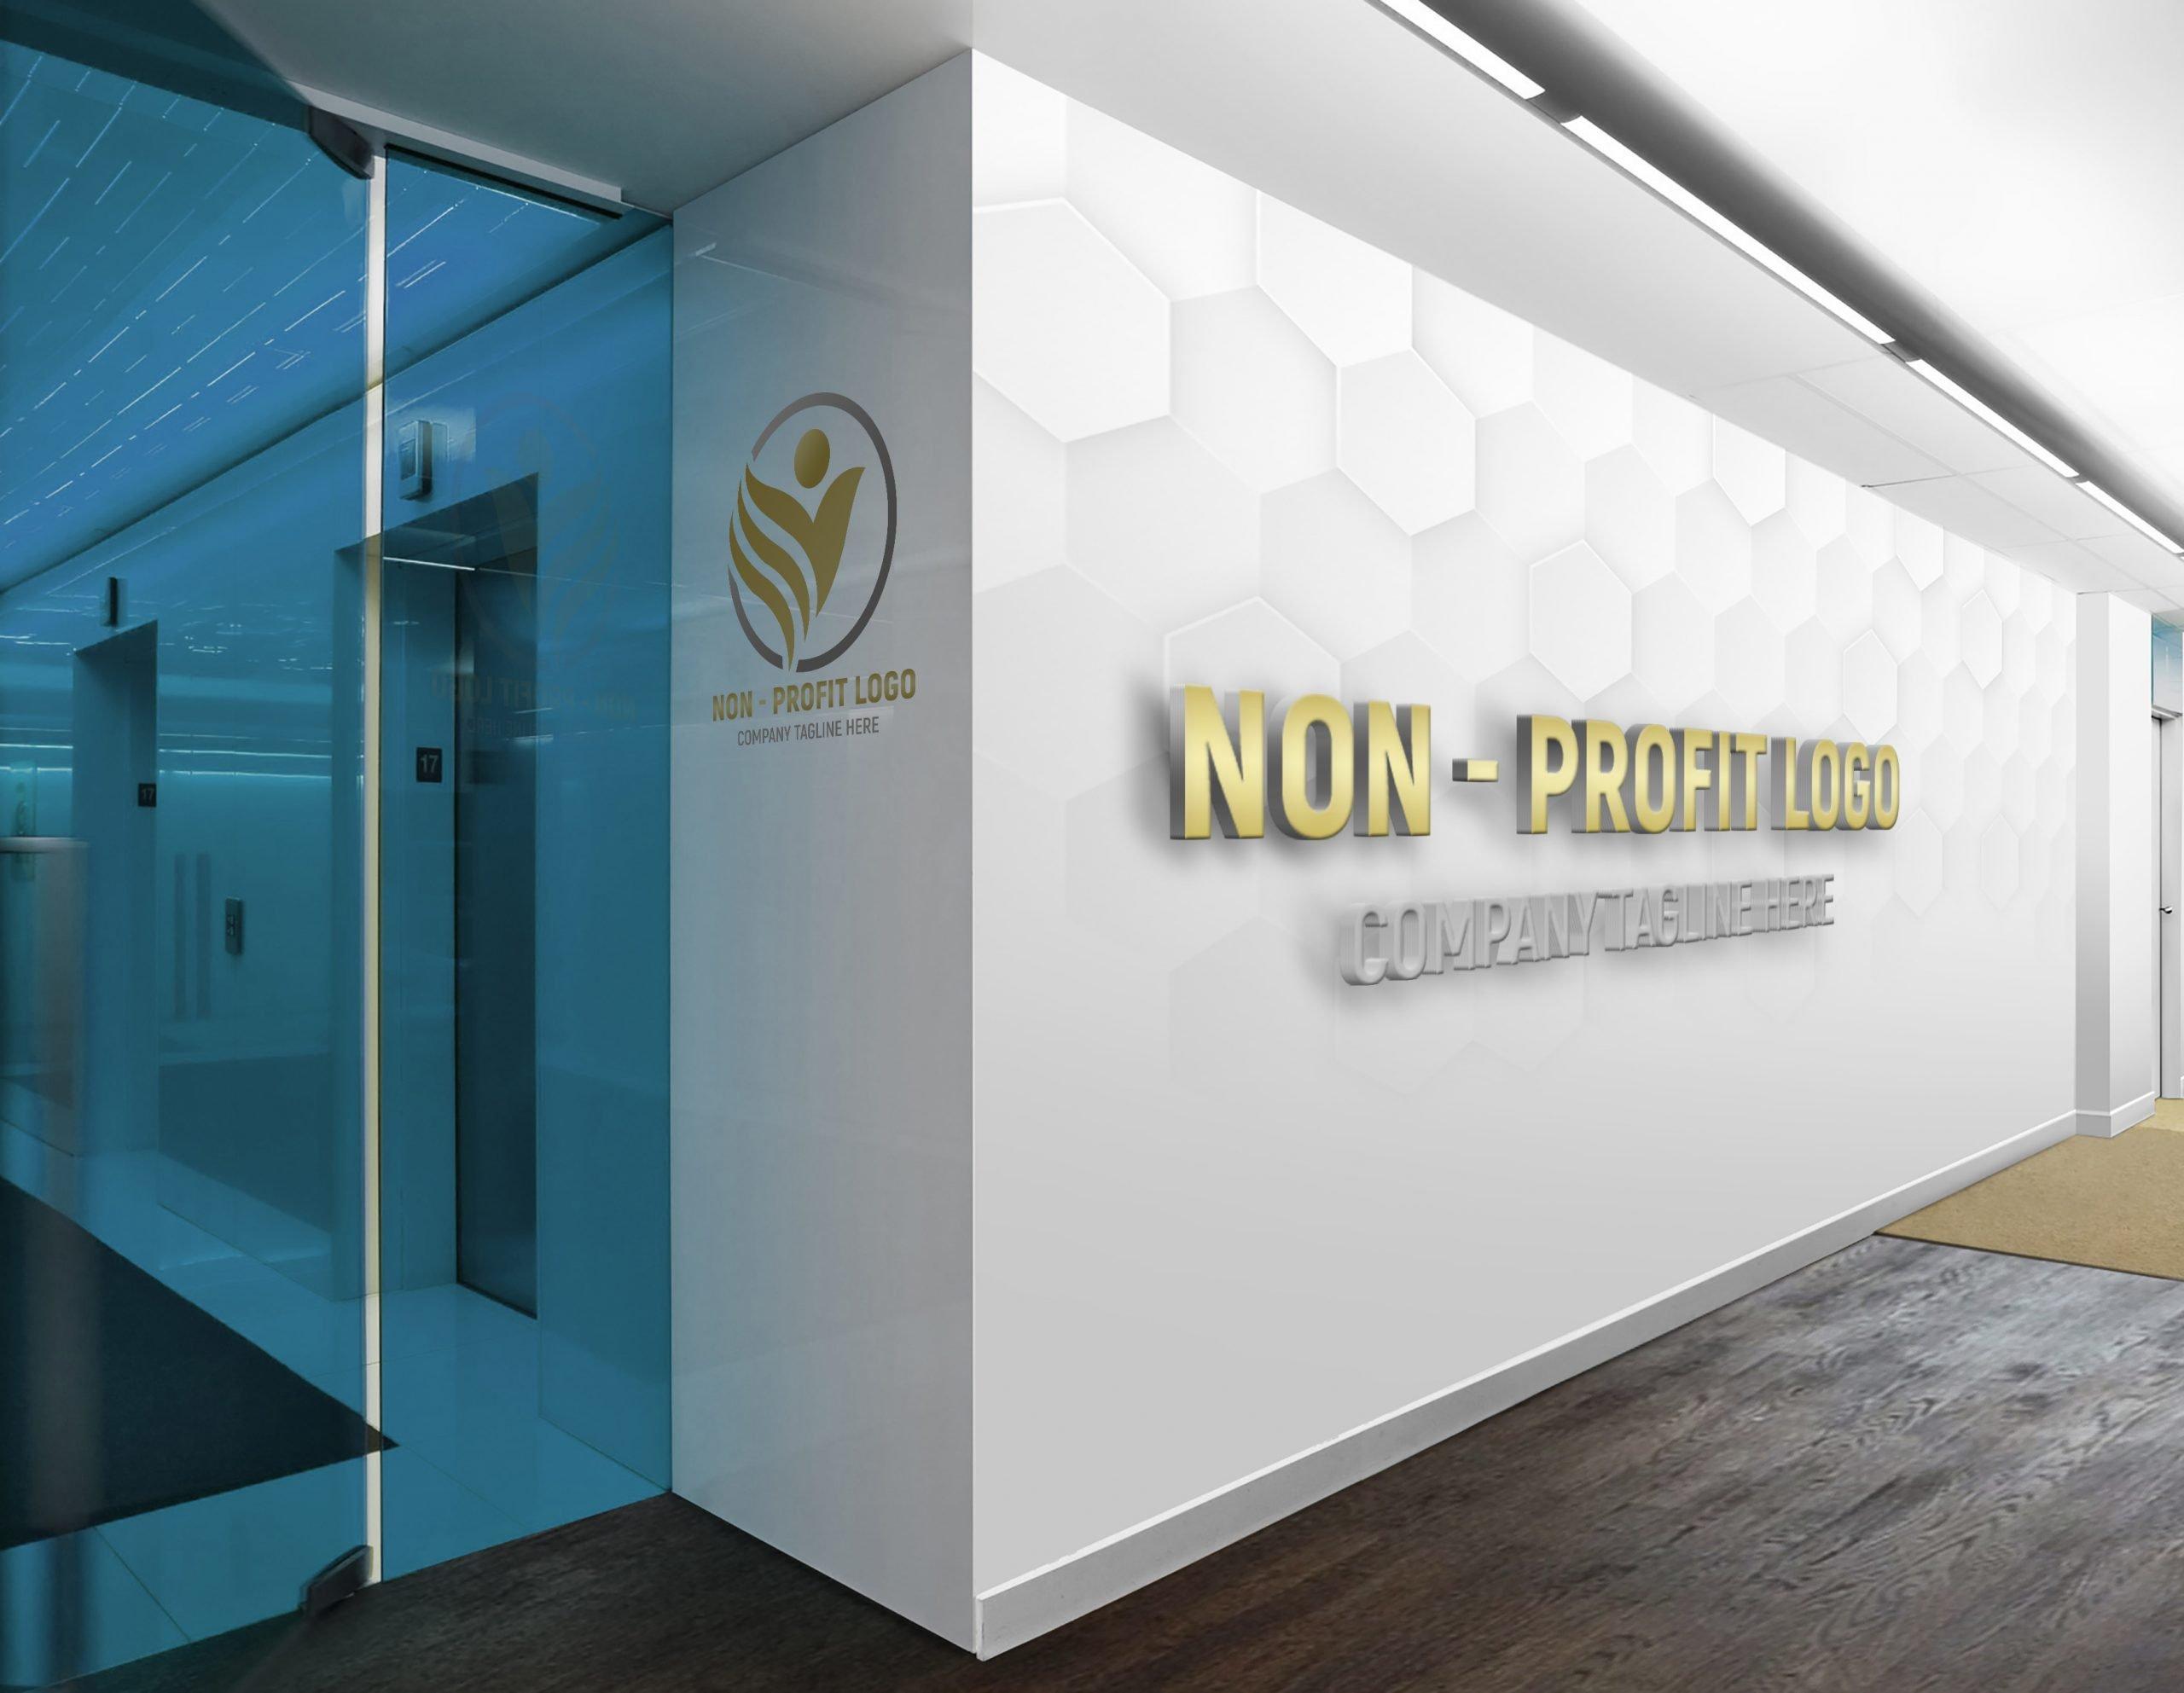 Non-Profit Company Logo Design on white wall